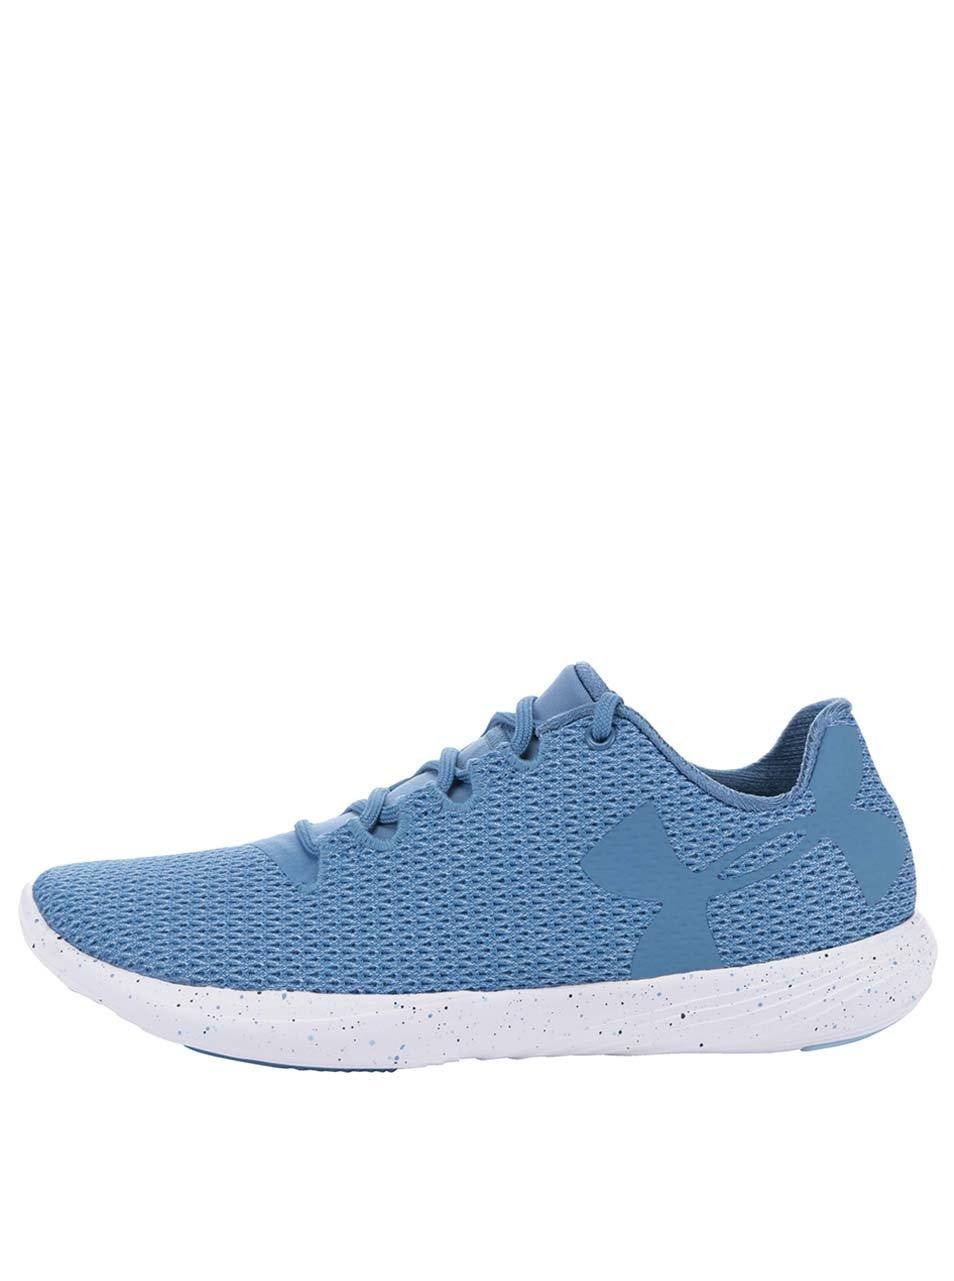 Modré dámské tenisky Under Armour UA W Street Prec Low Speckle